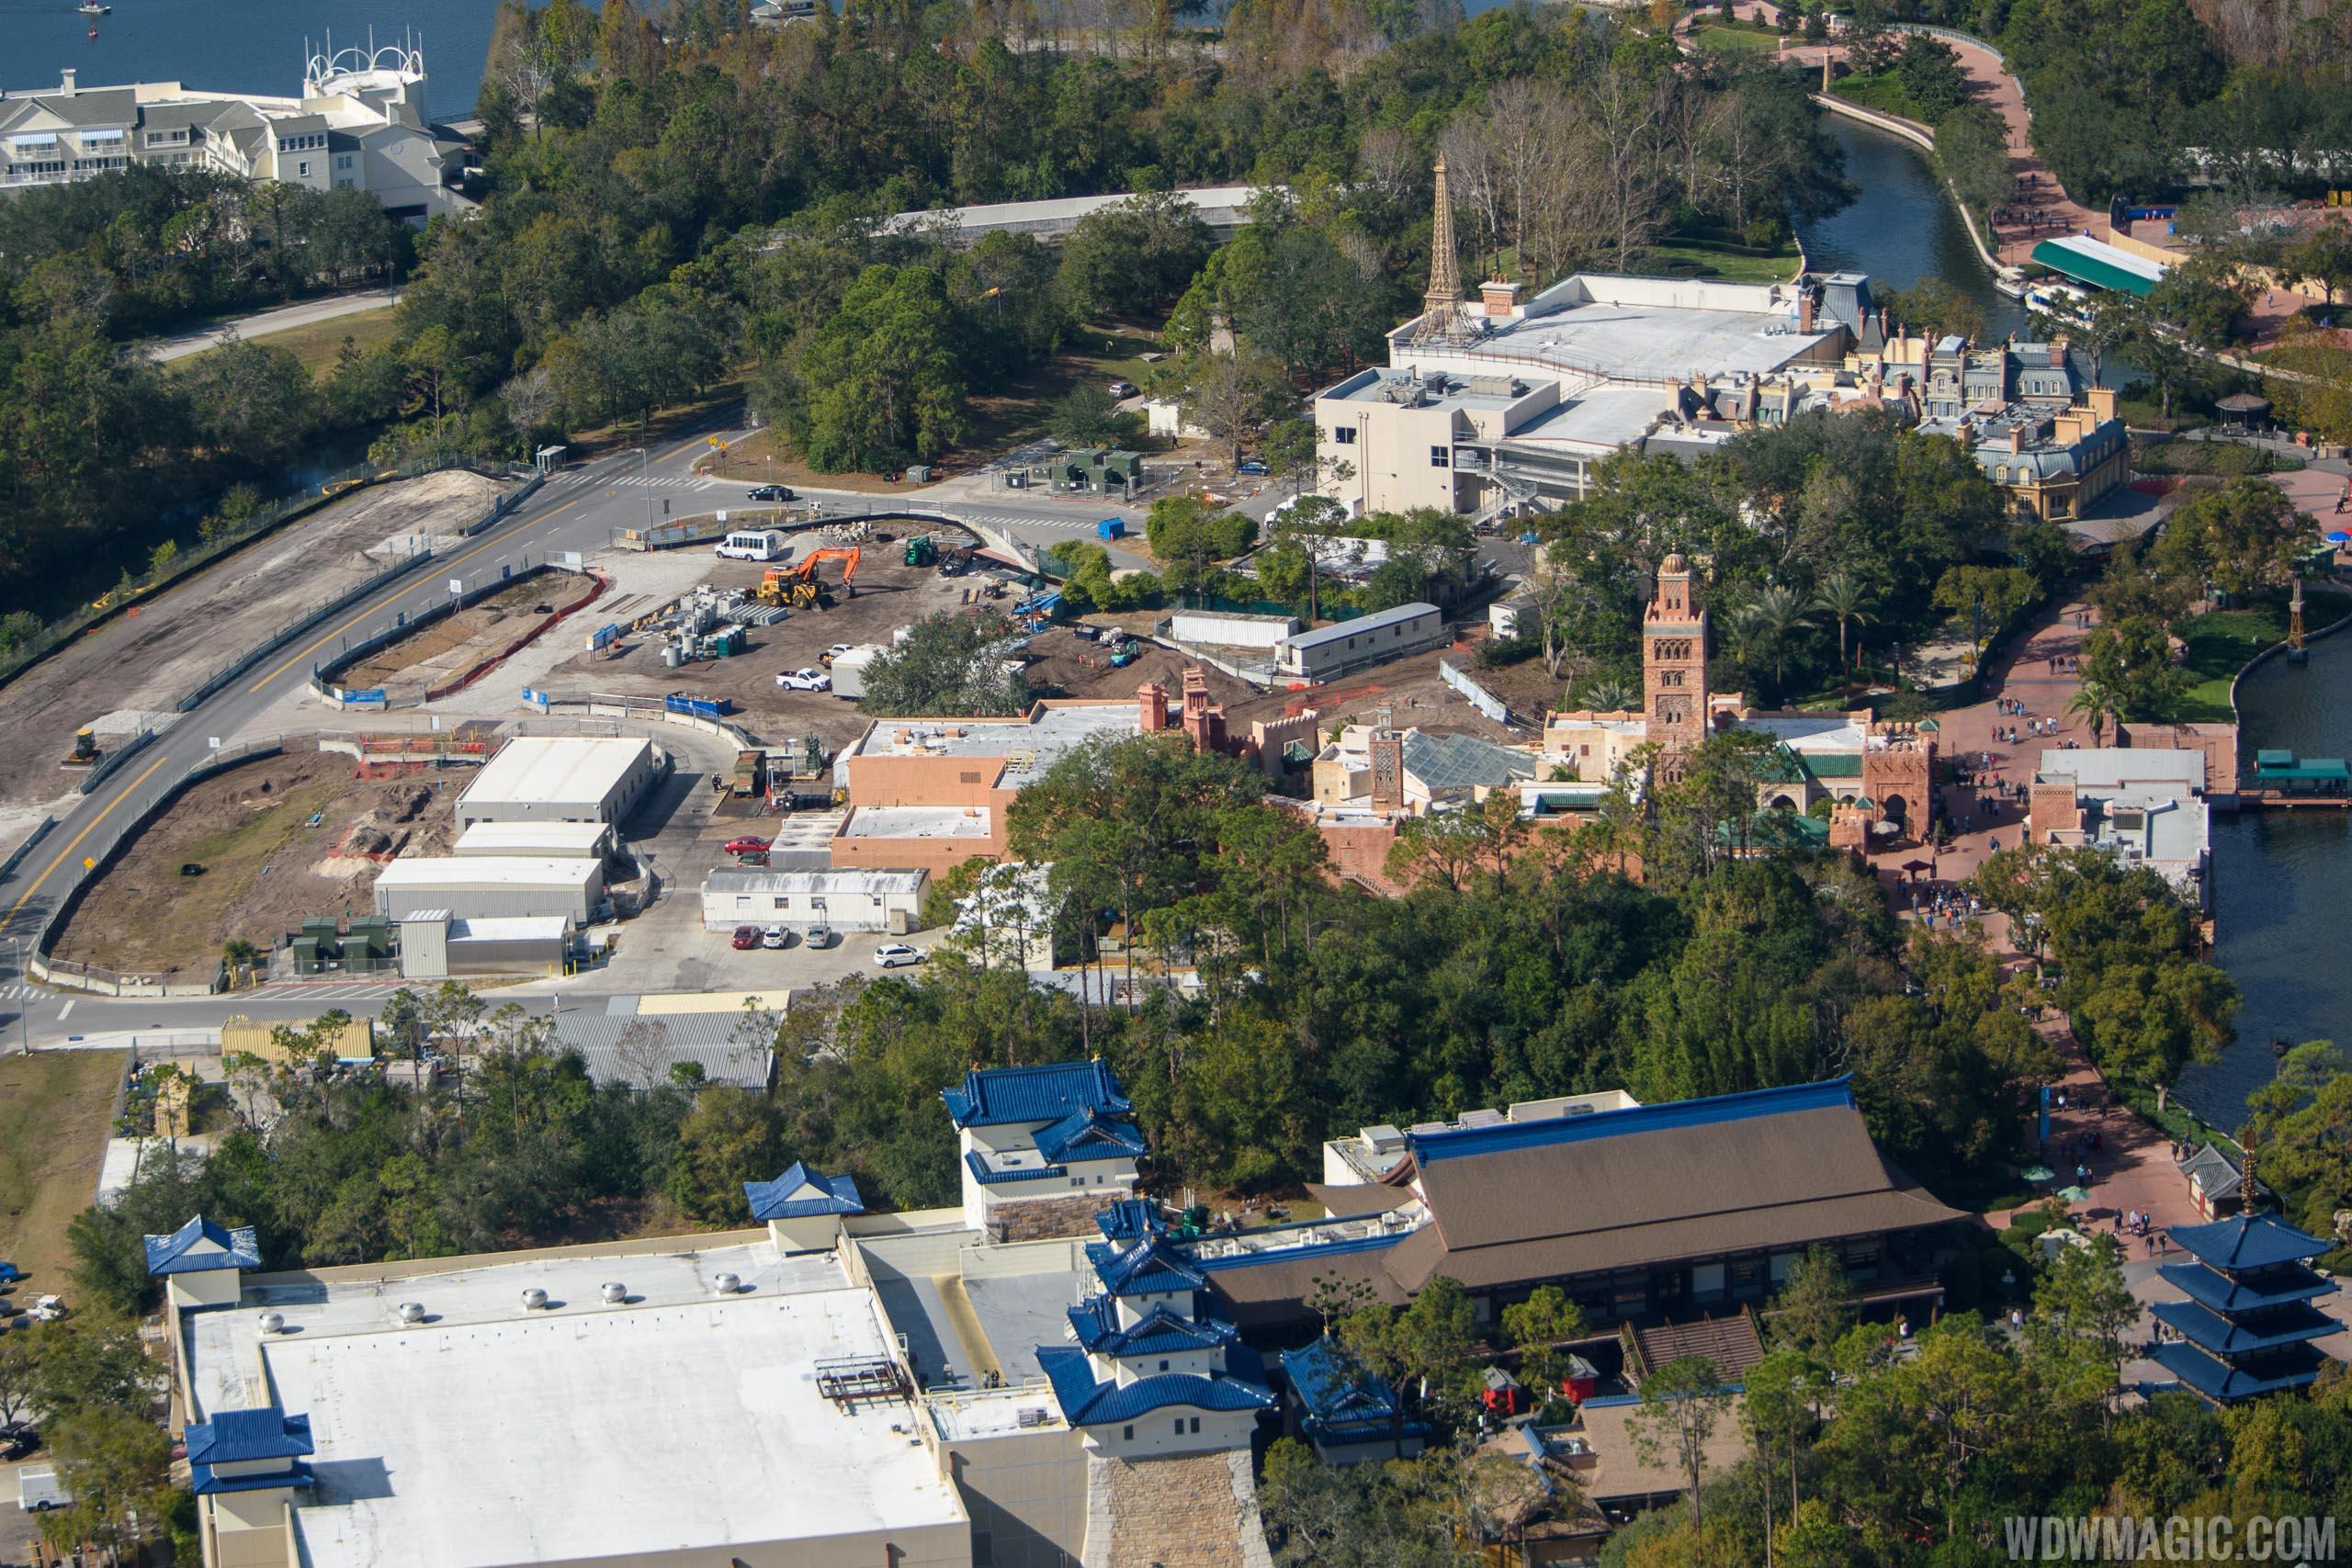 Ratatouille construction aerial view